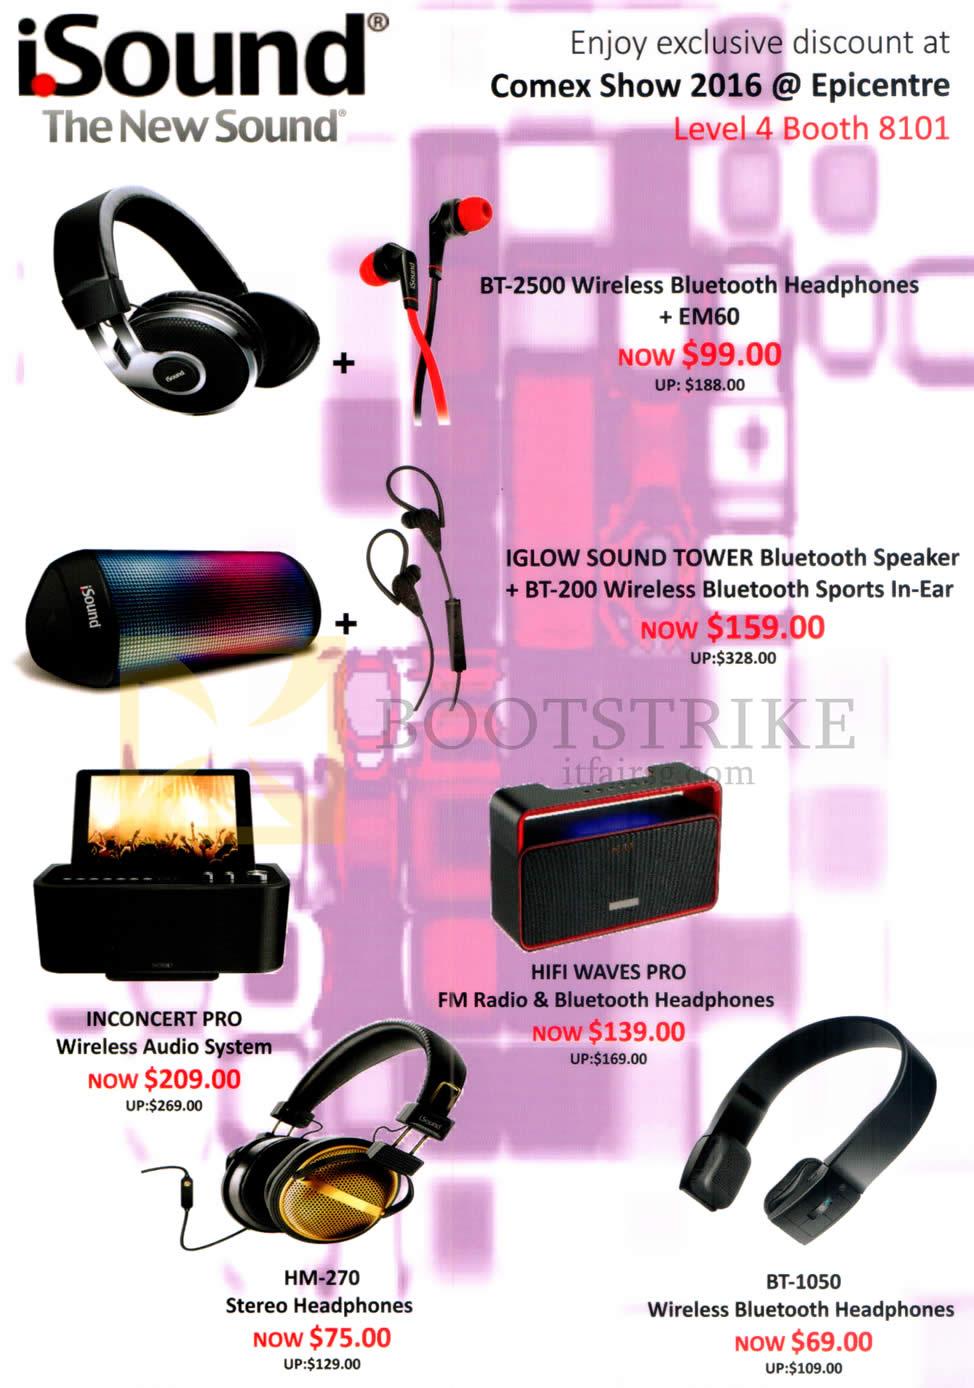 COMEX 2016 price list image brochure of Epicentre ISound Headphones, Speakers, Audio System, FM Radio, BT-2500, Iglow Sound Tower, BT-200, Inconcert Pro, Hifi Waves Pro, HM-270, BT-1050